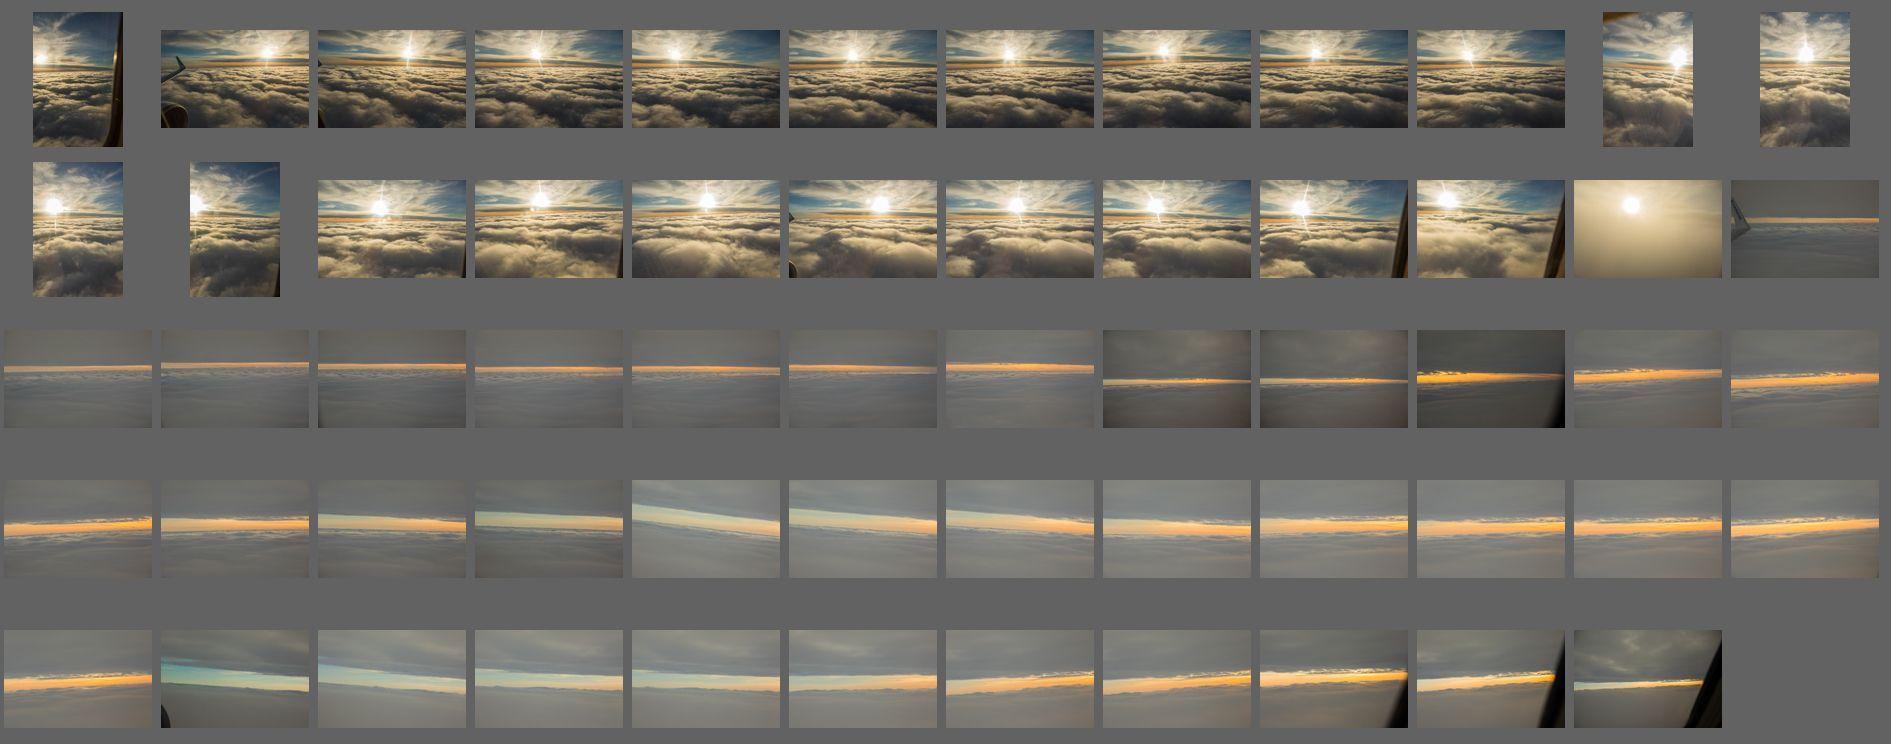 Aerial Clouds vol.7 بک گراند آسمان برای فتوشاپ پست پروداکشن